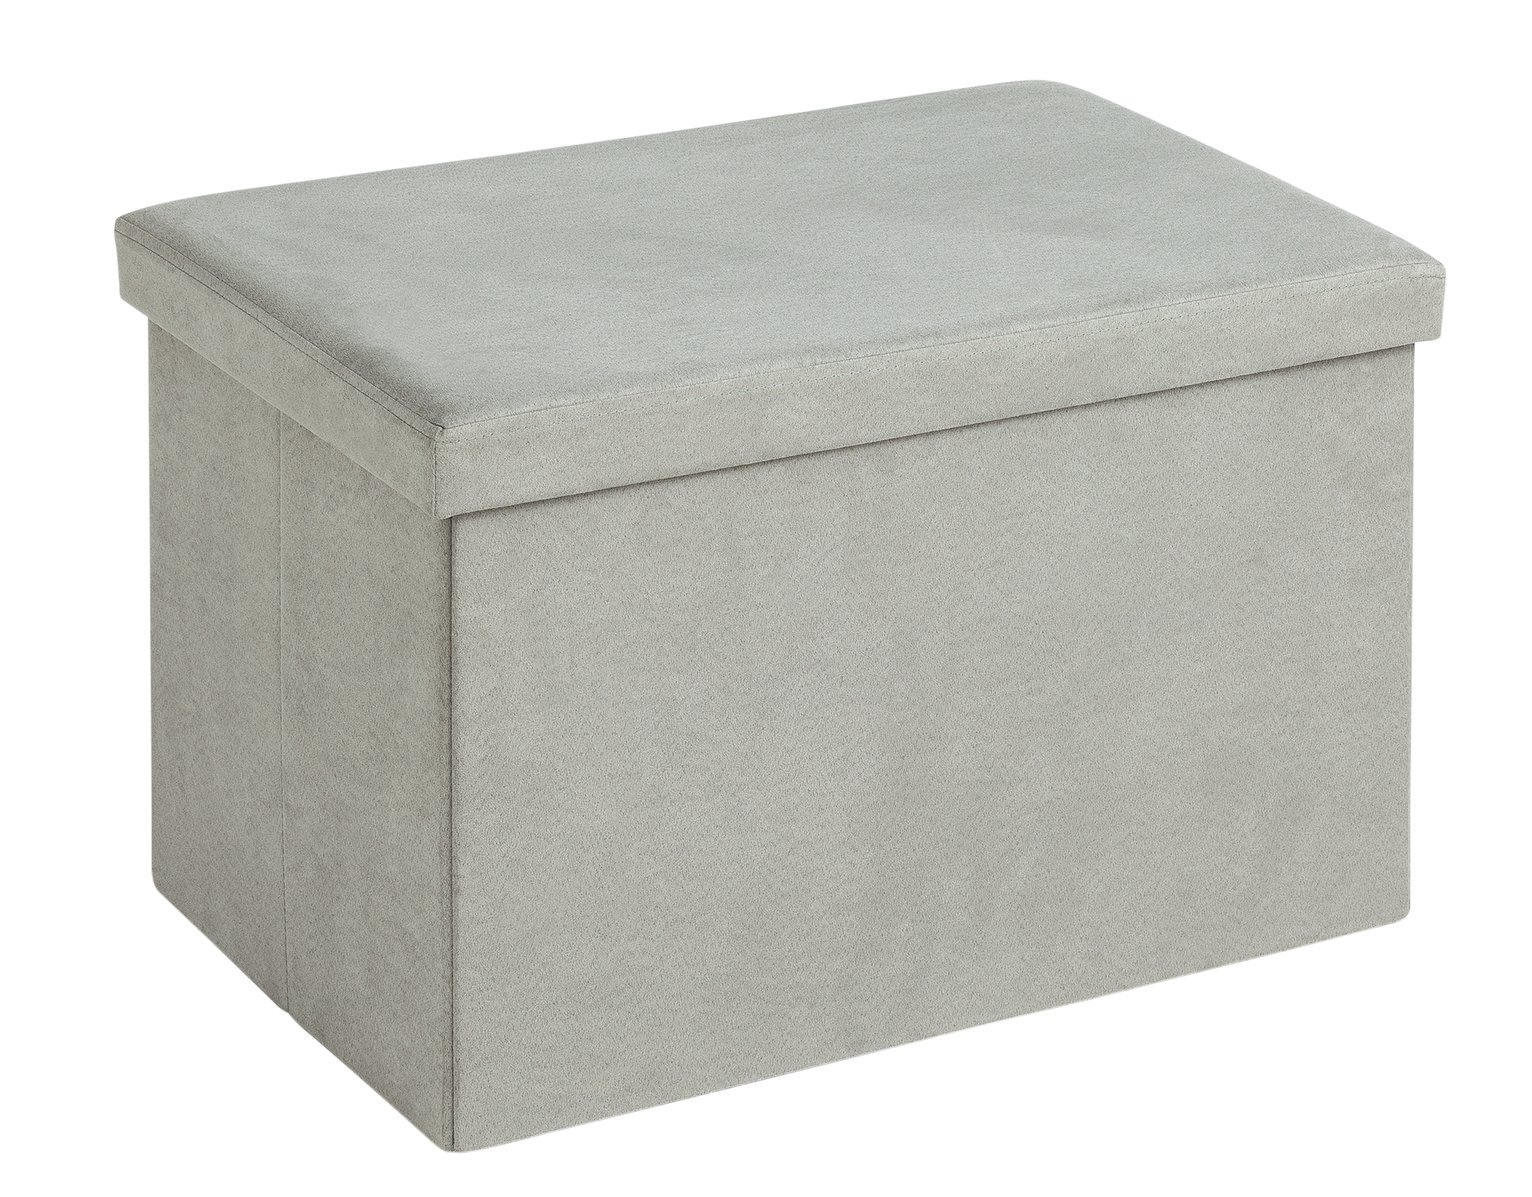 Large Fabric Ottoman - Grey